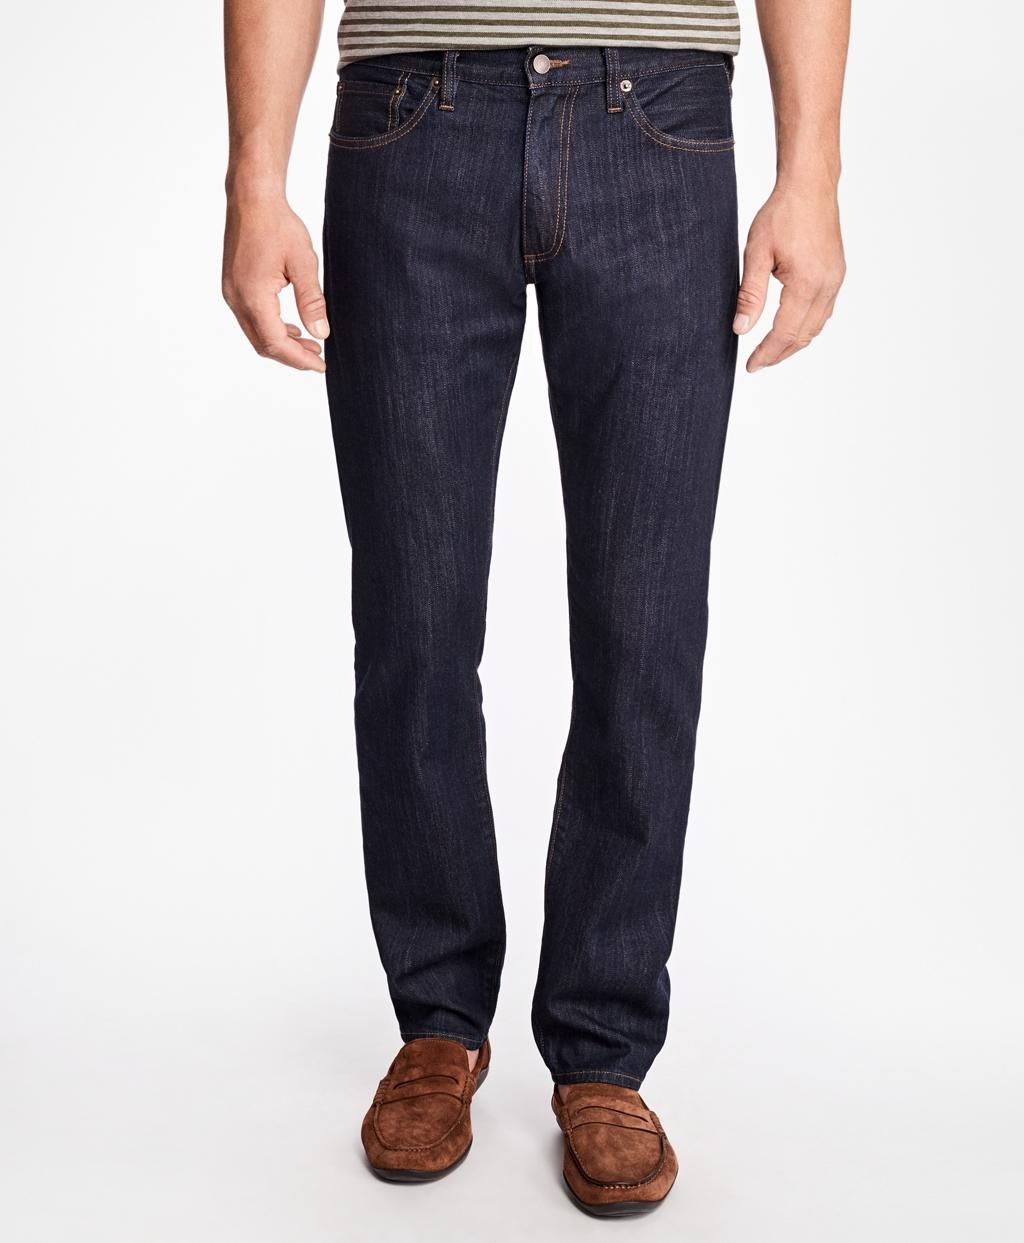 236e9e859a Supima® Stretch Denim Slim Fit Jeans - Brooks Brothers